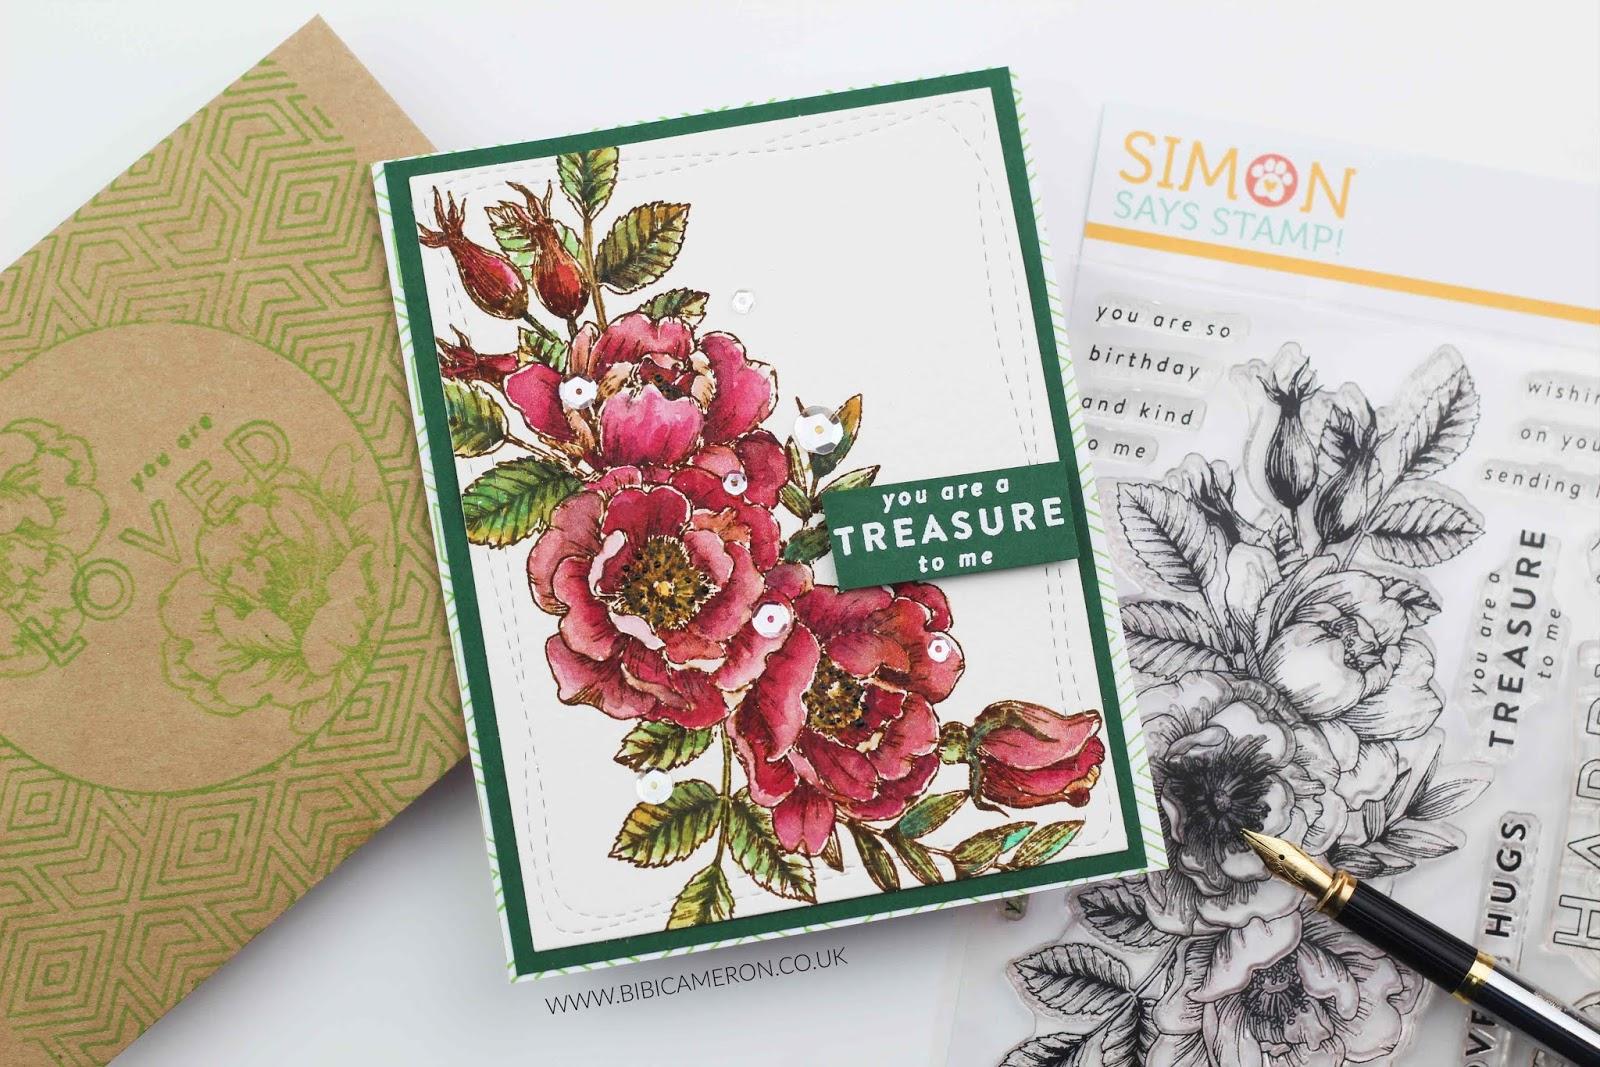 Beautiful flowers by simon says stamp bibi cameron hello there izmirmasajfo